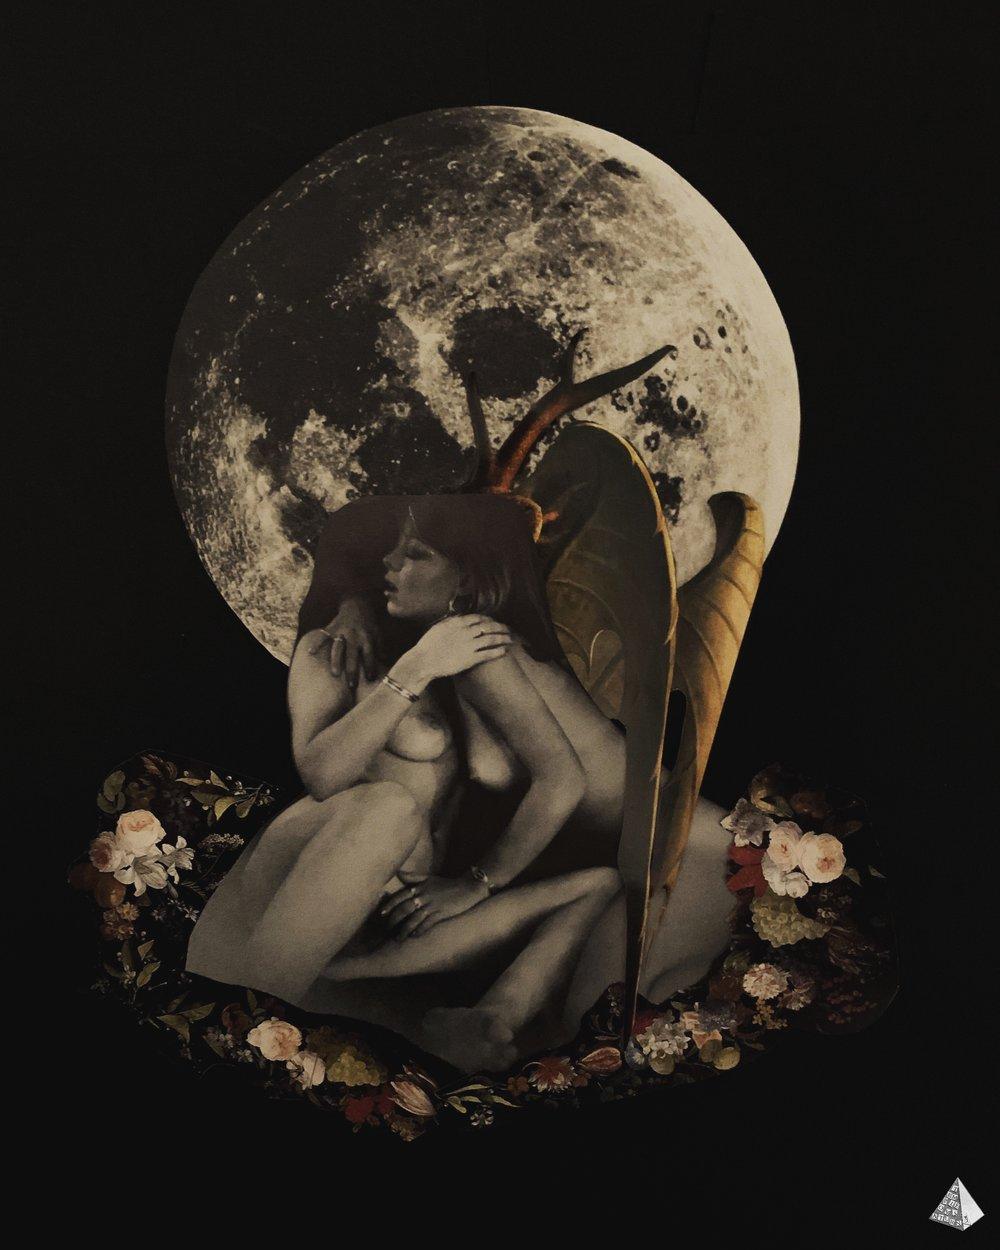 Les Fleurs du Mal: Femmes Damnées by Joan Pope (Temple ov Saturn)